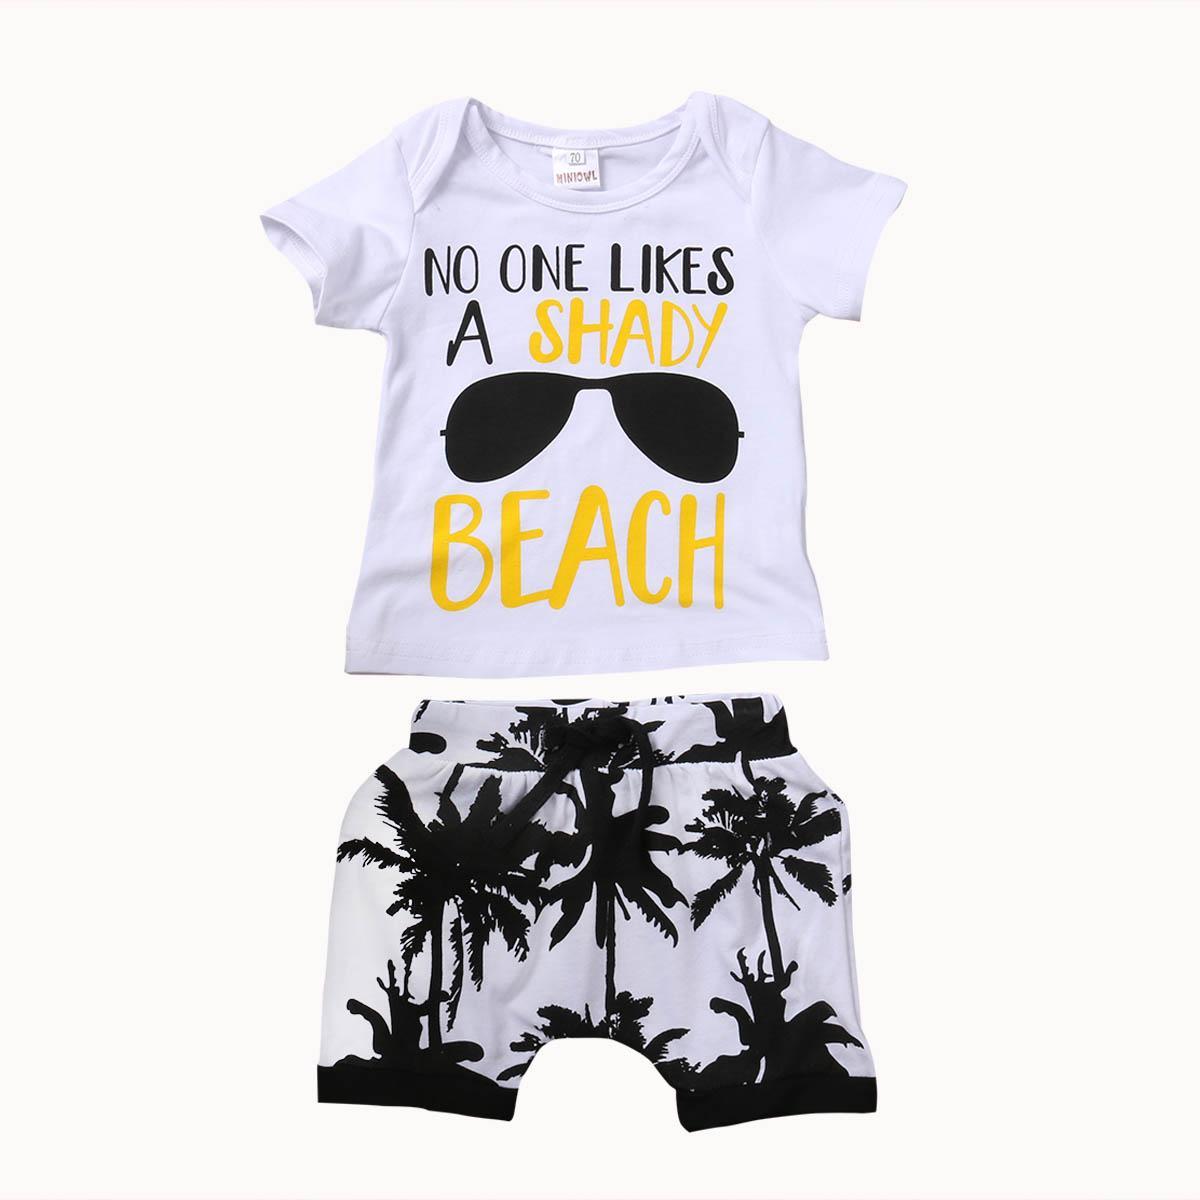 2ST Kleinkind-Kind-Baby-Jungen-Mädchen-Kleidung stellt 2017 Sommer Kurzarm Baumwolle T-Shirt Top + Shorts Hot Pant Outfit Kinder Kleidung